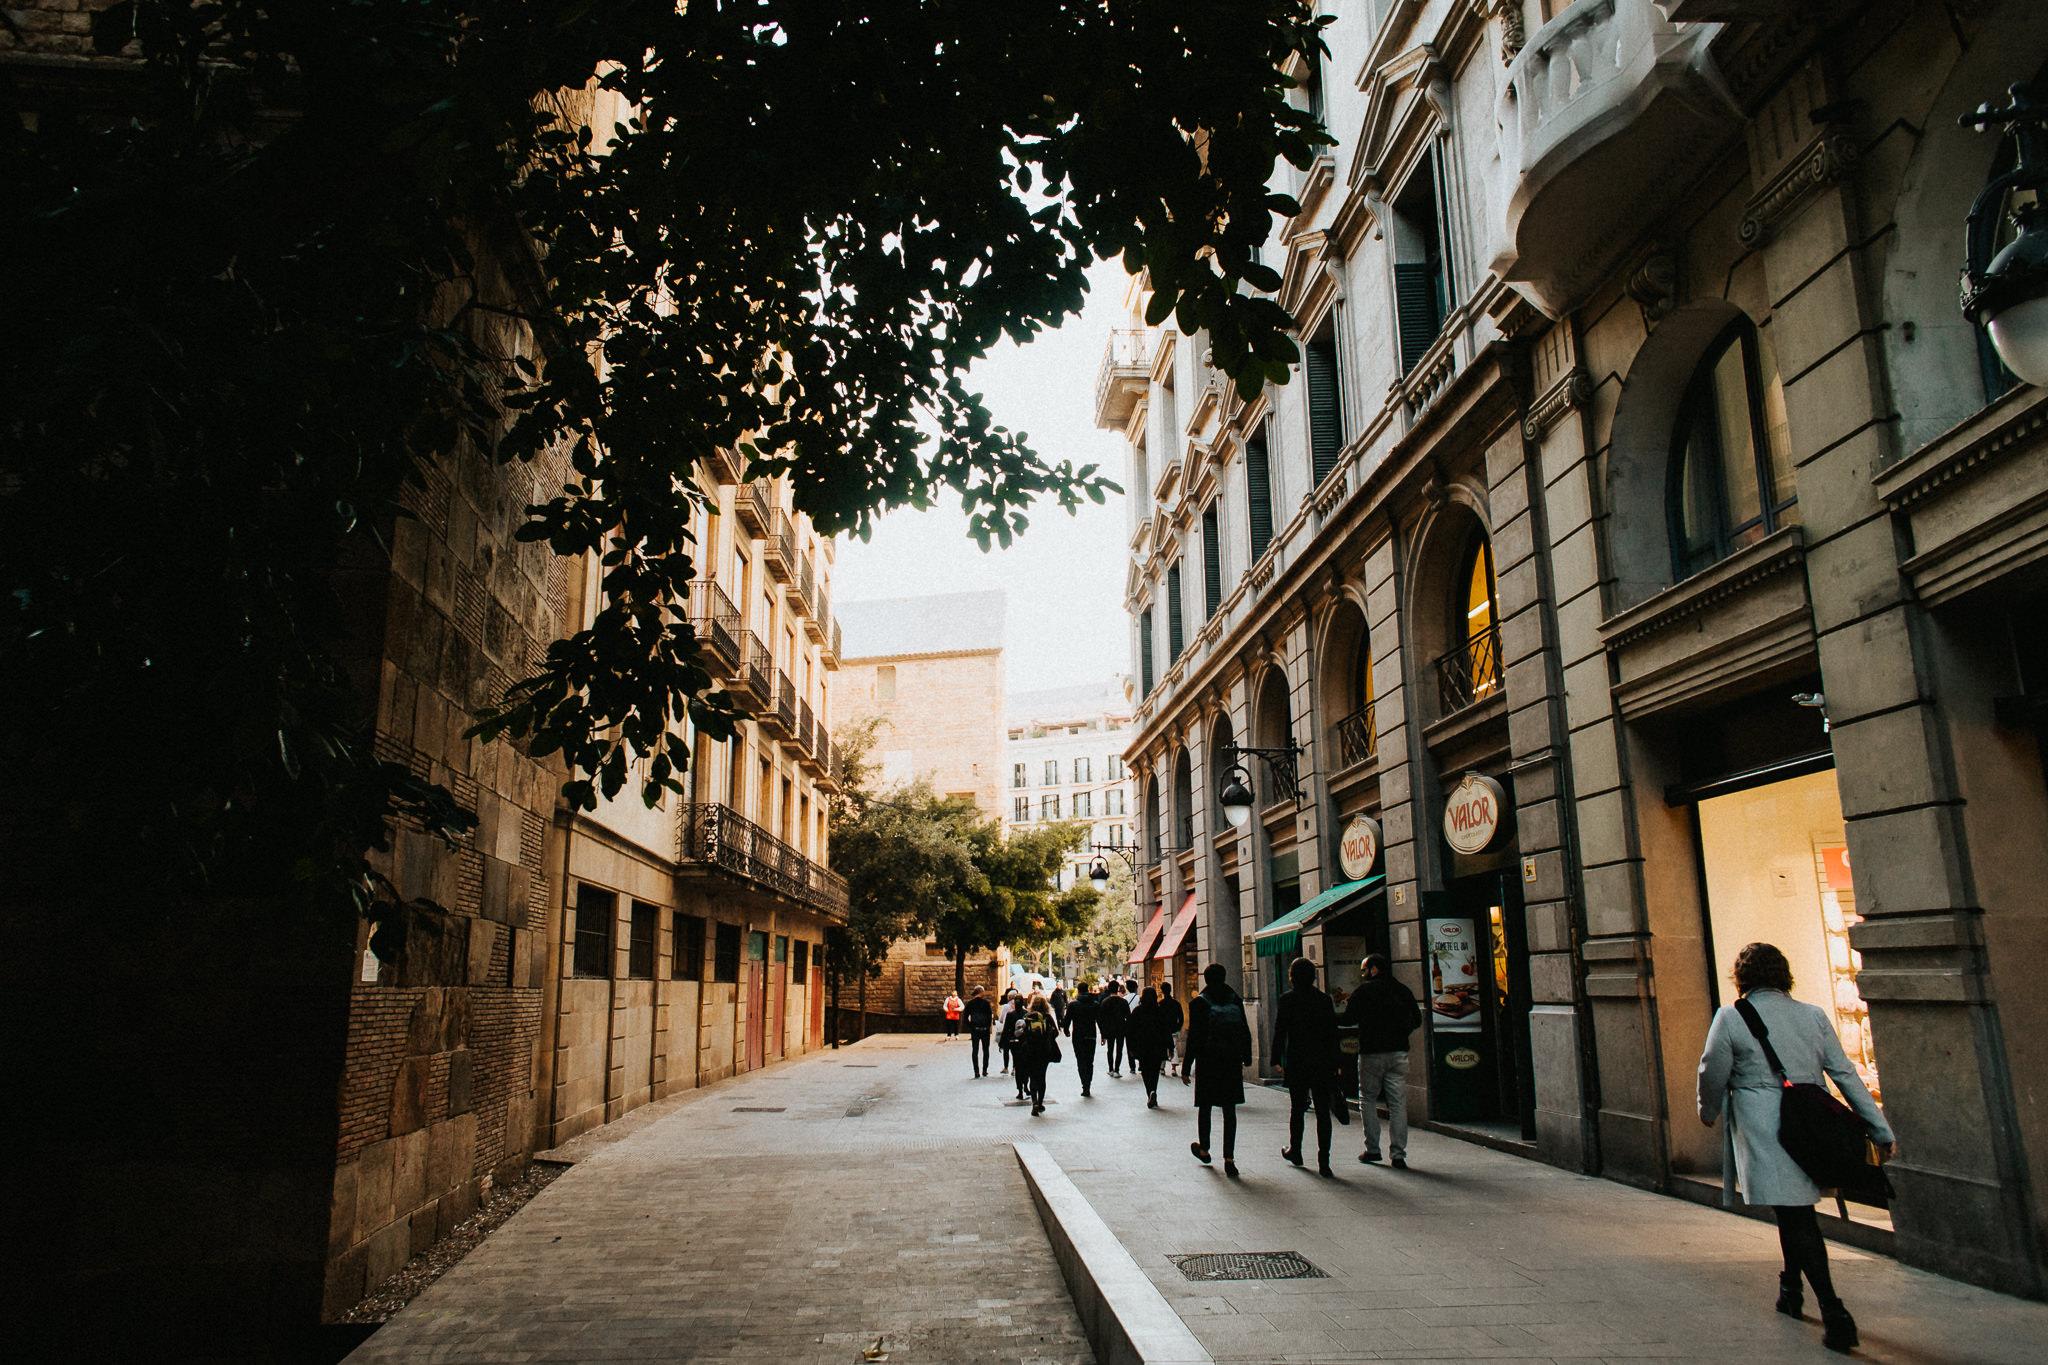 Barcelona-destination-photographer-alfred-tang-17.jpg